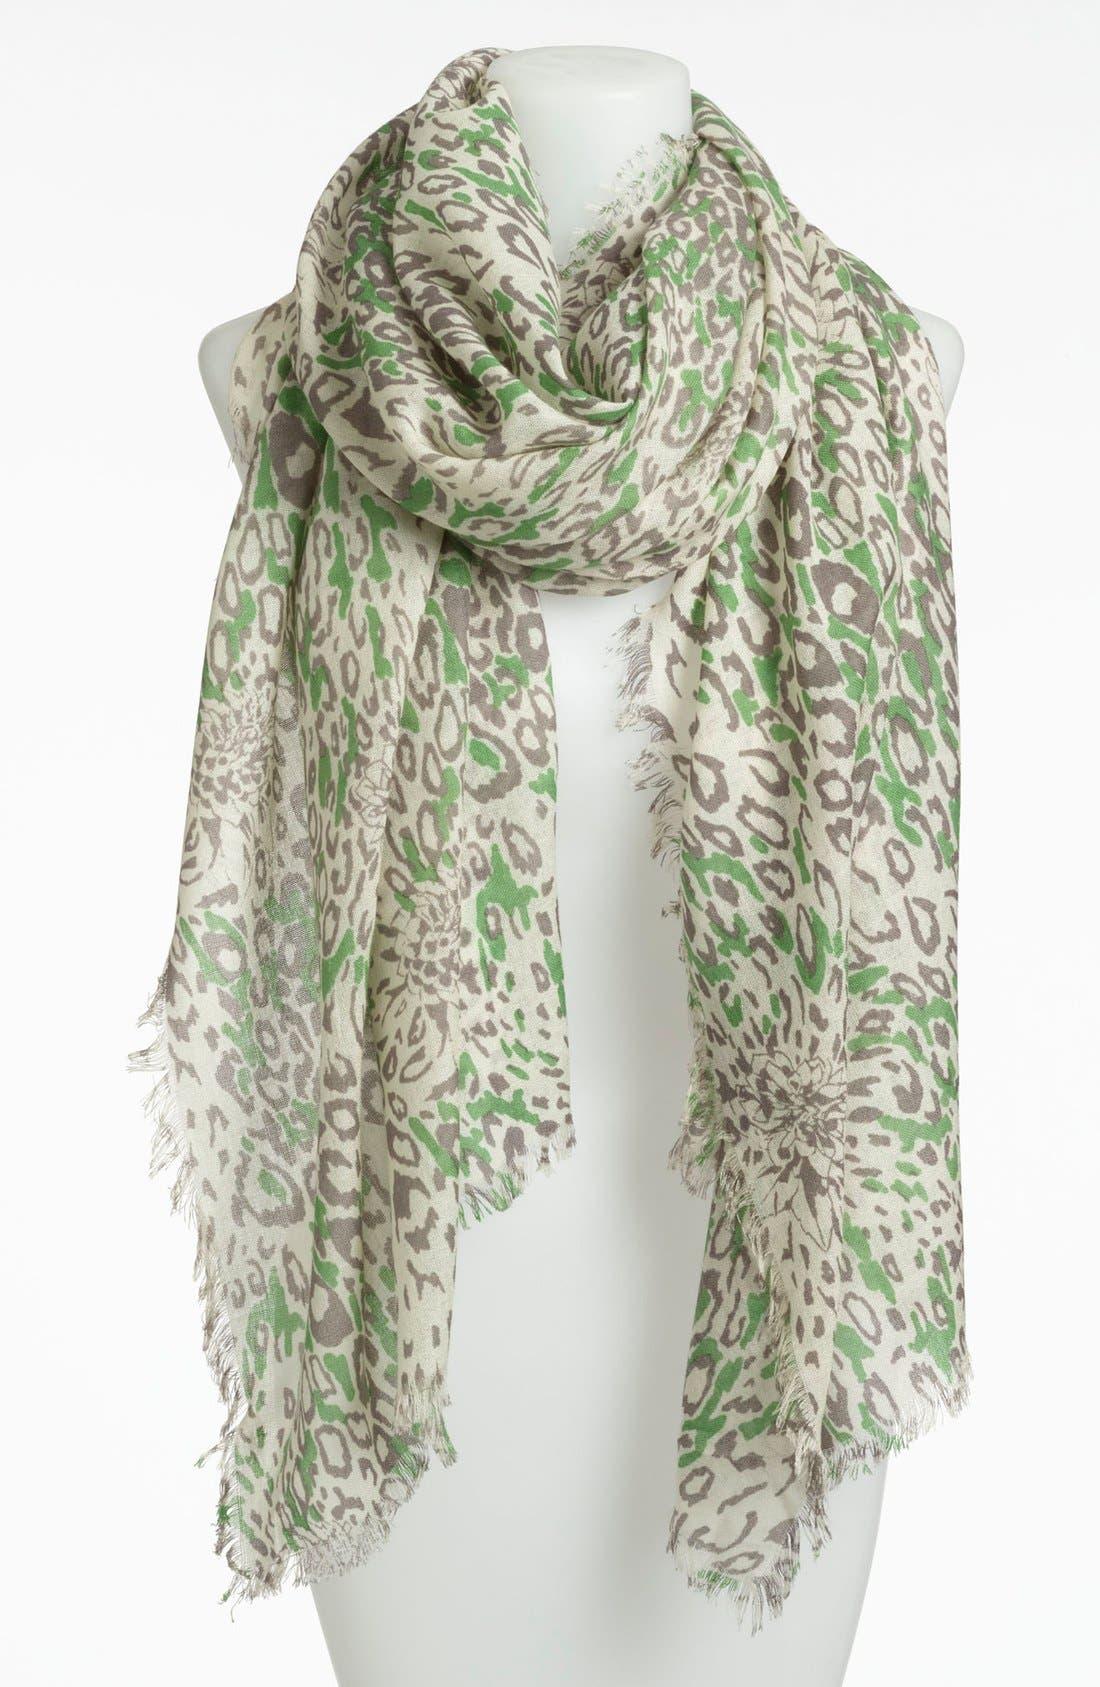 Main Image - Nordstrom 'Garden Leopard' Print Wool Scarf